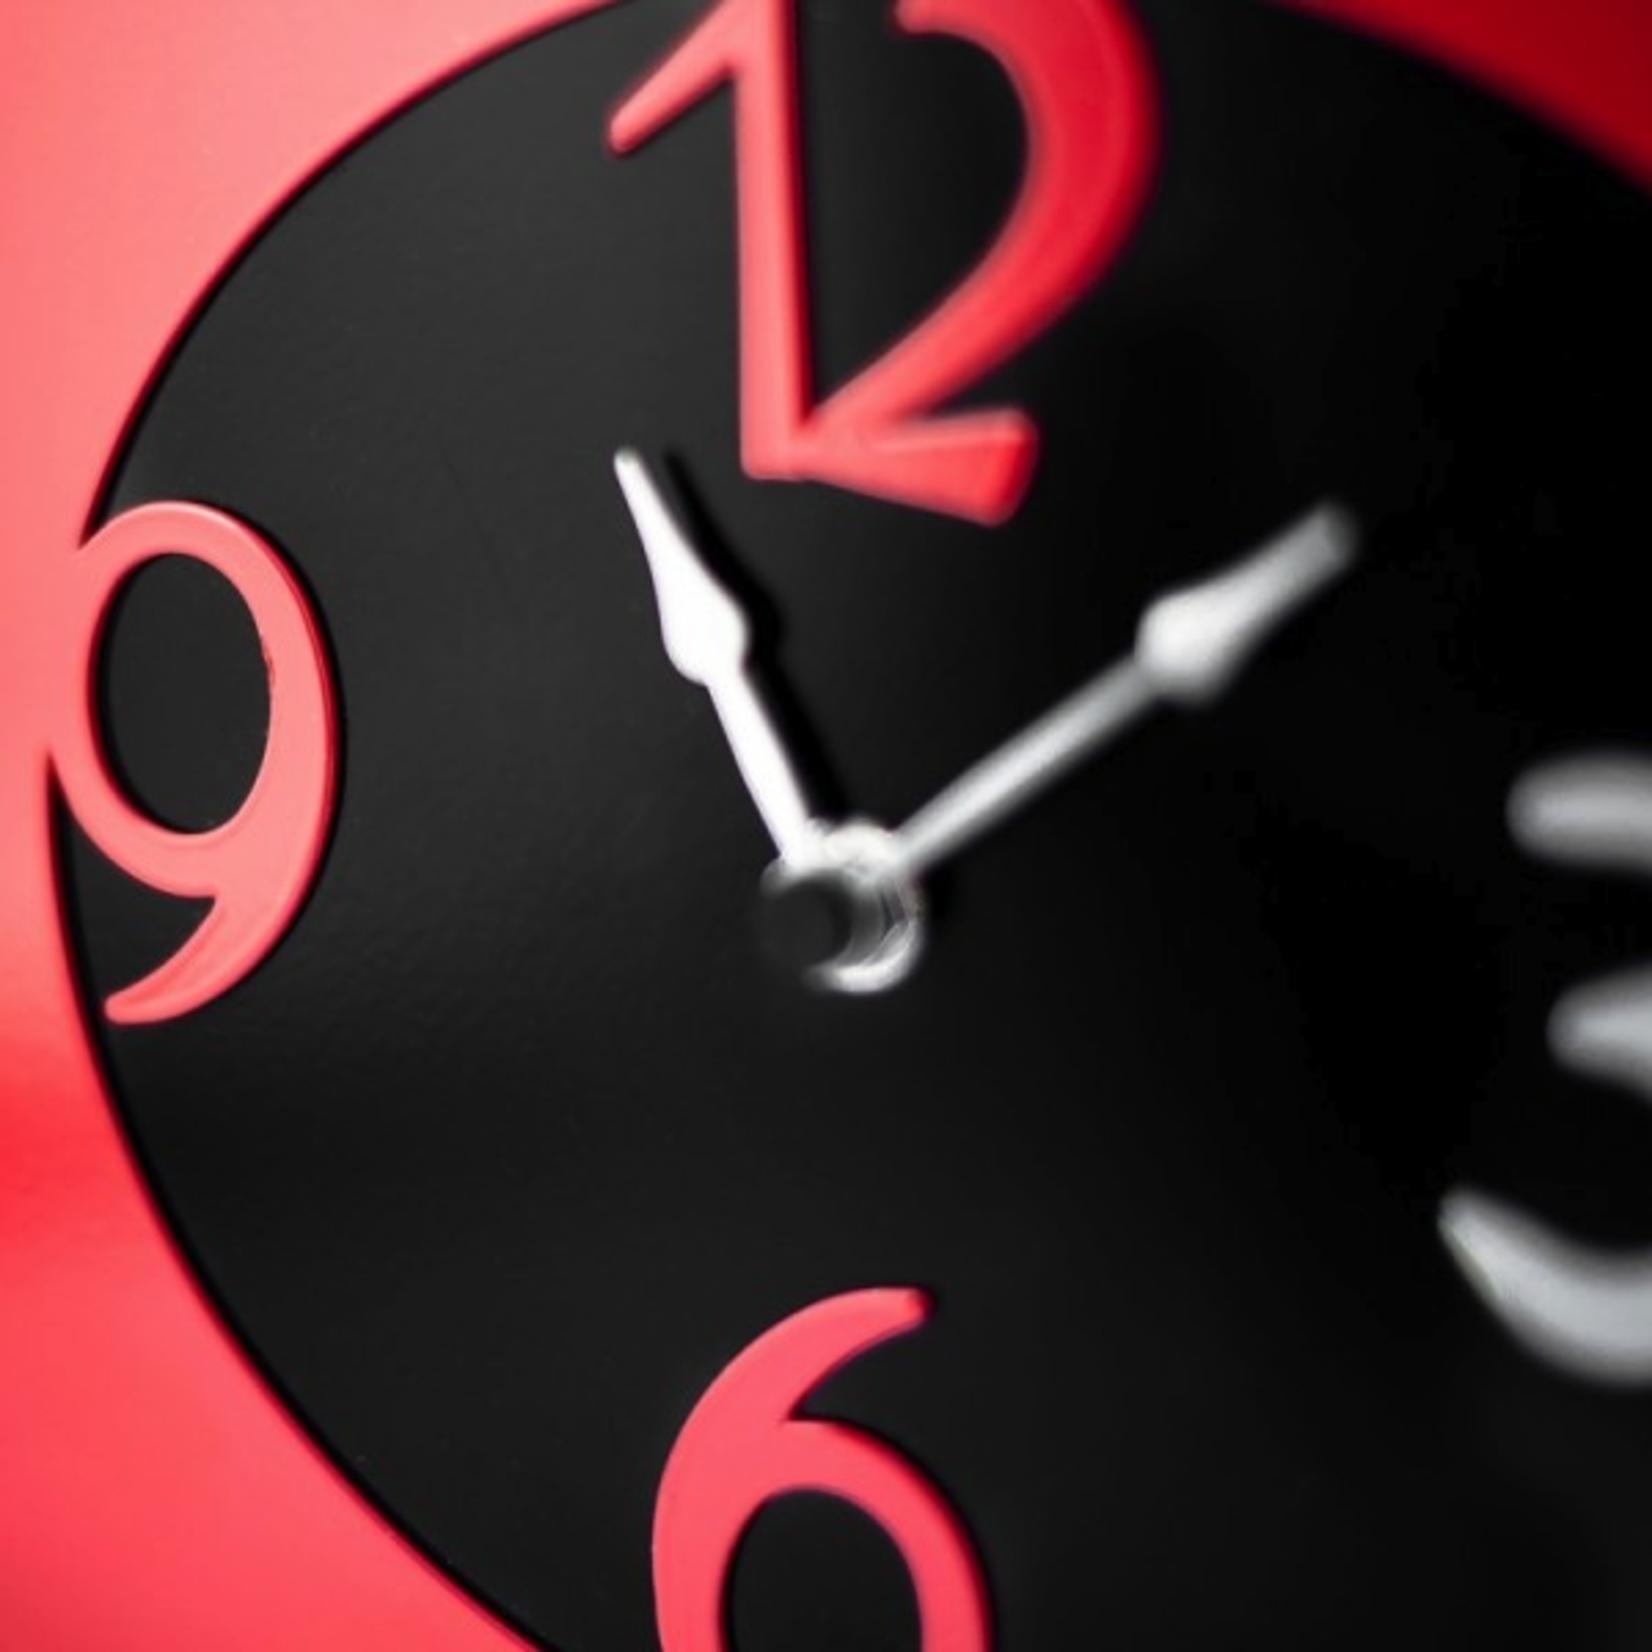 Lifestyle Clock, Vespa Apple Wall Clock Red